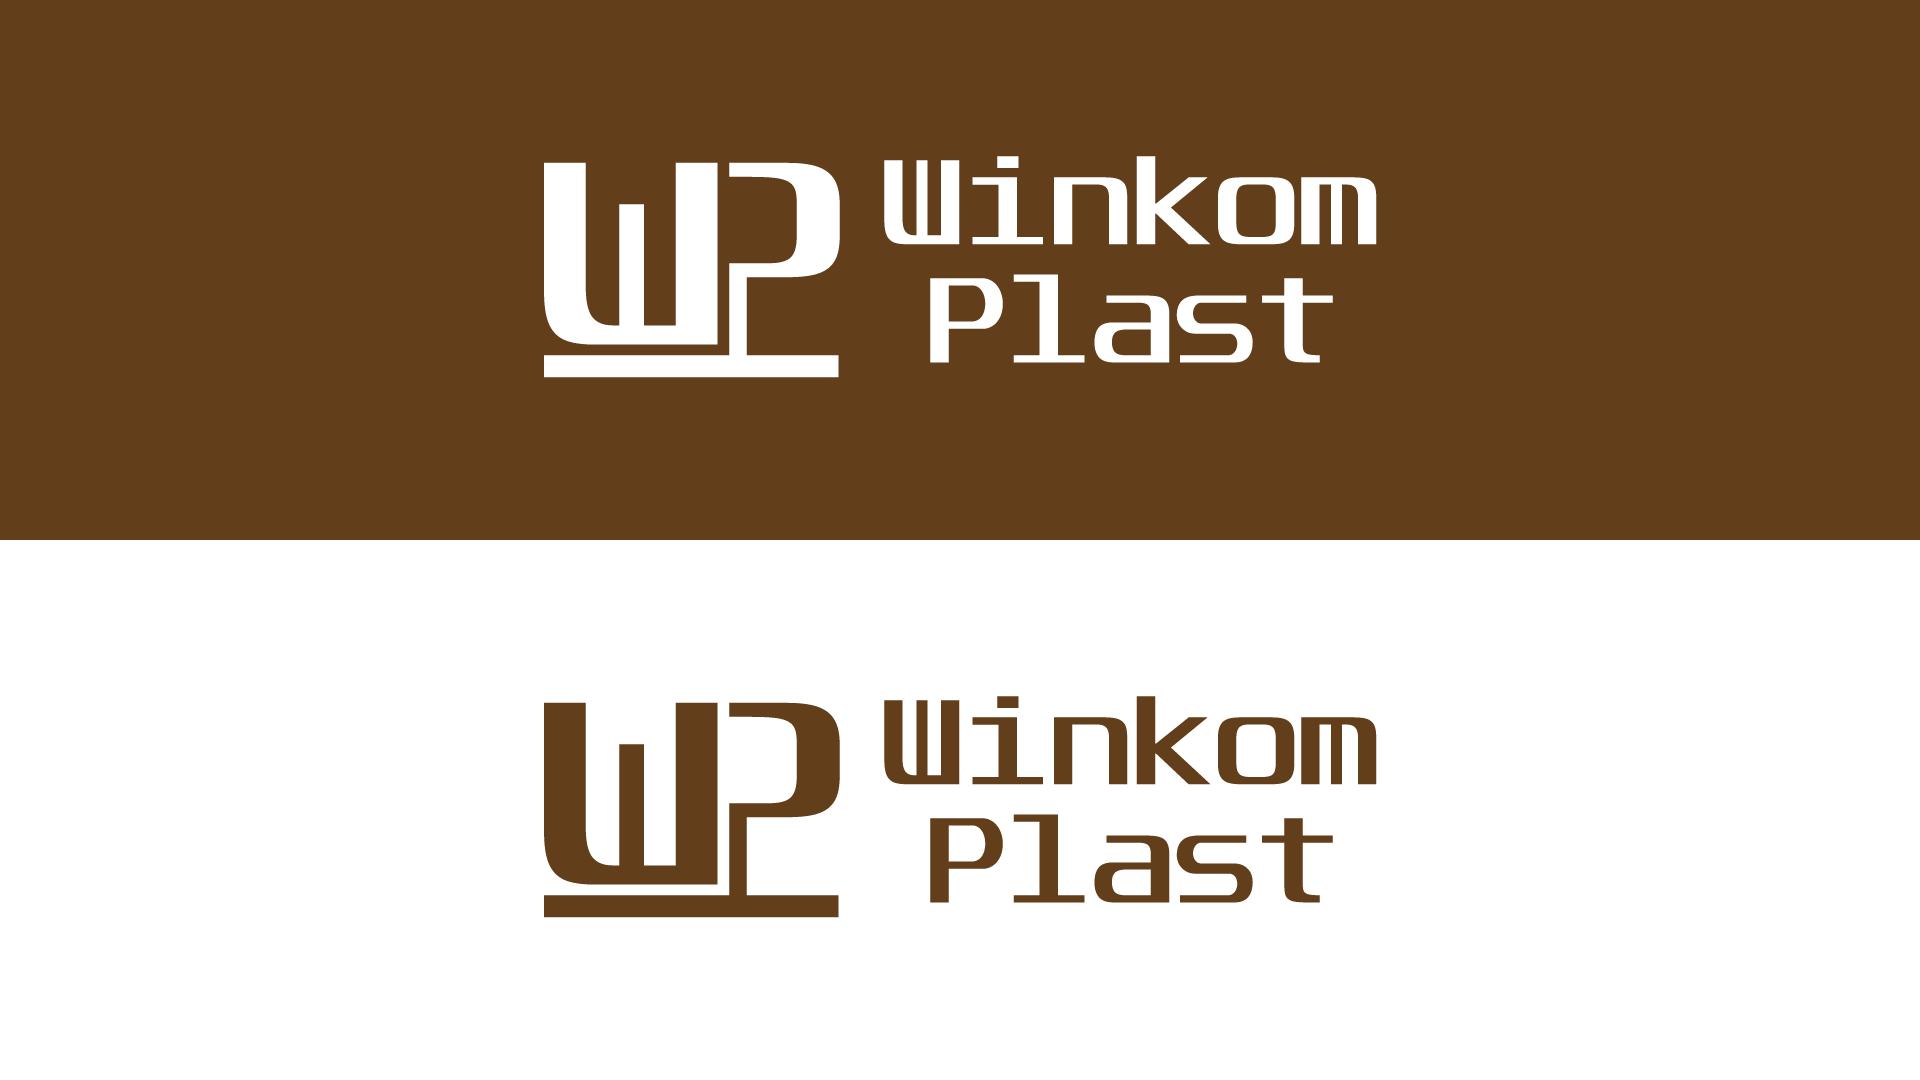 Логотип, фавикон и визитка для компании Винком Пласт  фото f_2325c45d10194d00.png